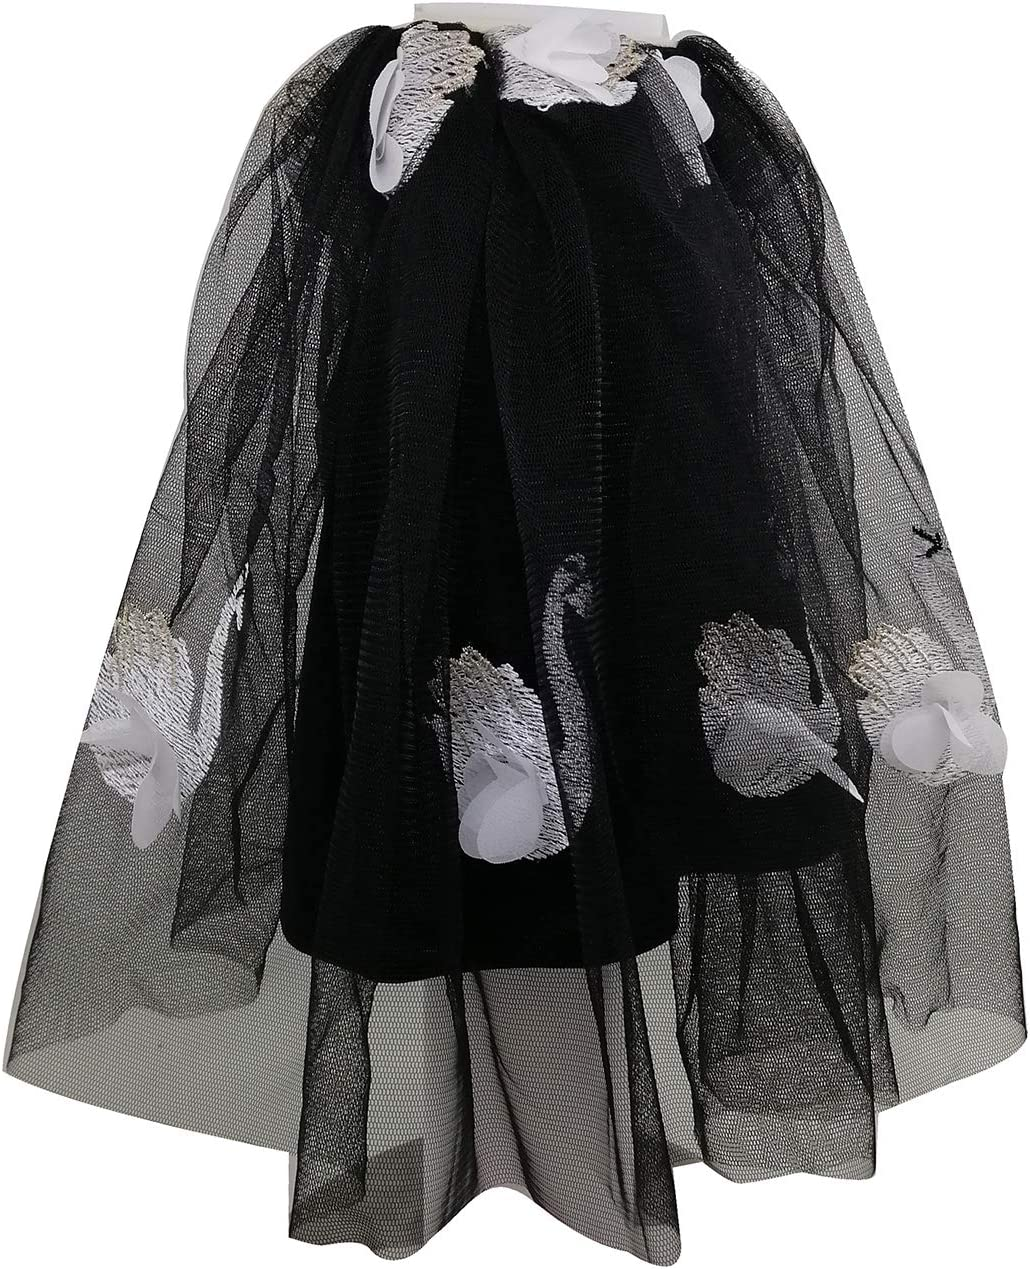 EVA BJD Set of Fashion Clothes Wigs Shoes Socks Accessories Full Set for 1//3 21-23inch 60cm BJD Dolls Abby